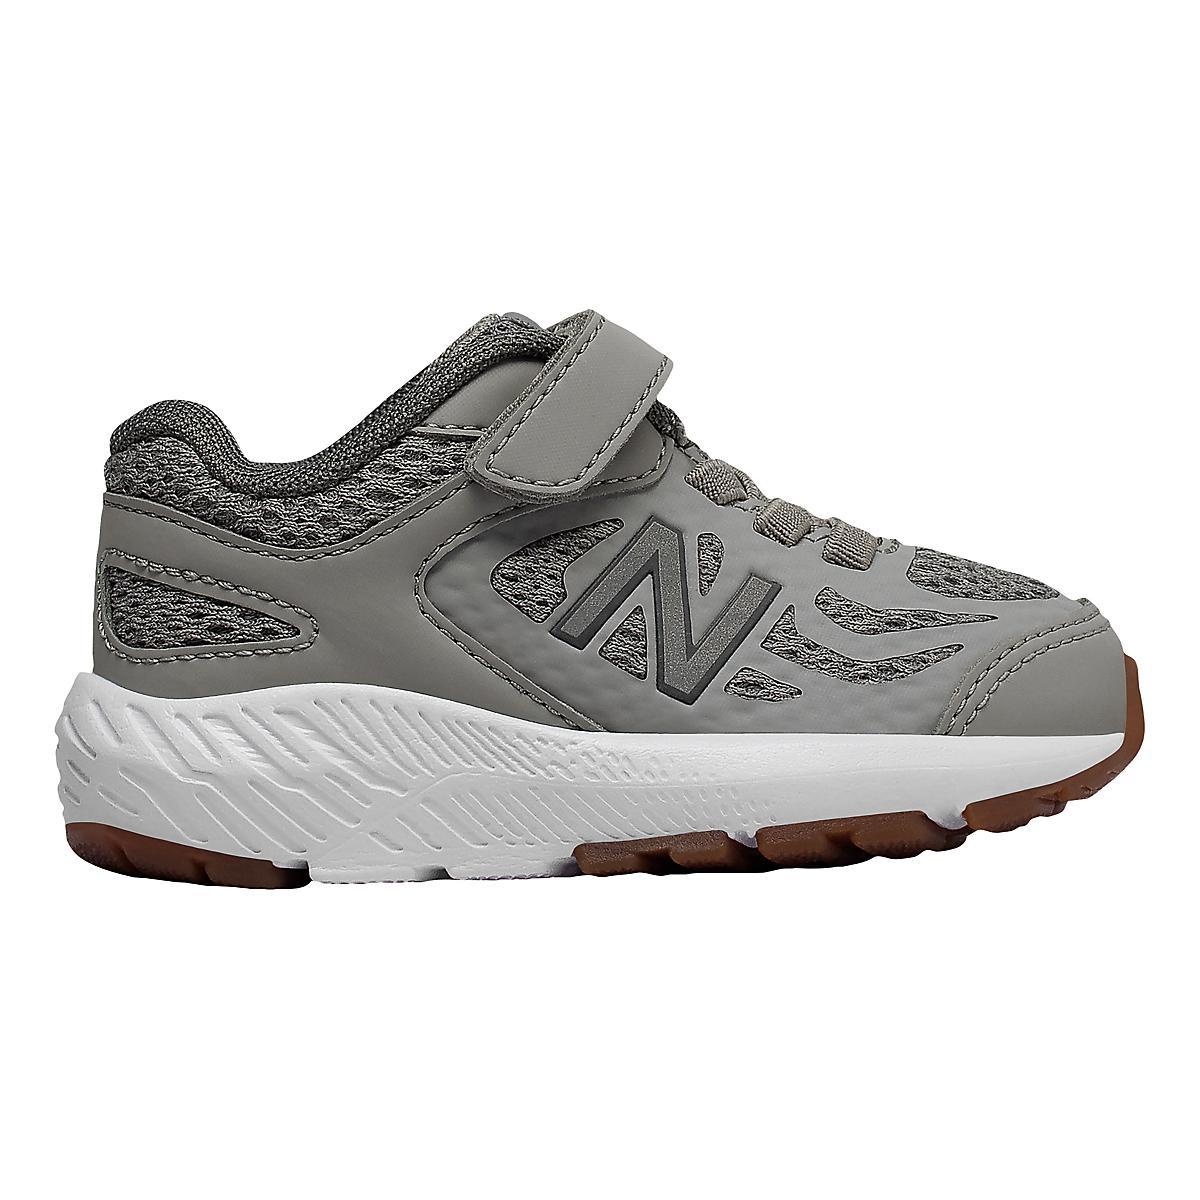 New Balance 519v1 Running Shoe(Children's) -Pigment/Pink Glo Cheap 2018 Newest I0zjQ5el